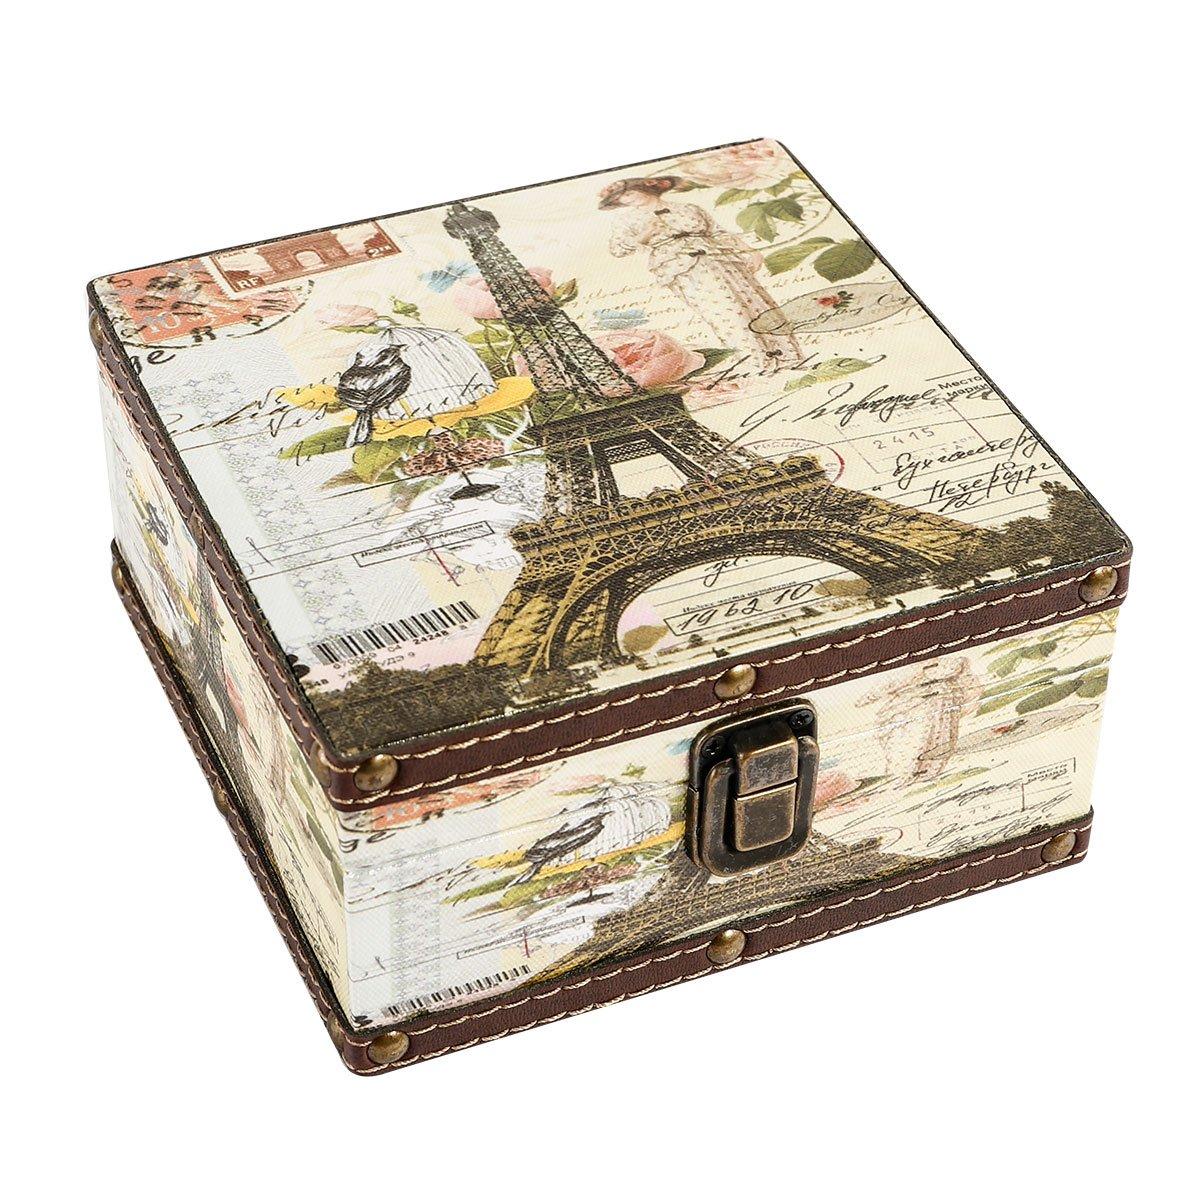 WaaHome Wood Jewelry Keepsake Storage Box Memory Boxes Eiffel Tower Decorative Boxes For Girls Kids, 6.4''LX6.4''WX3.2''H